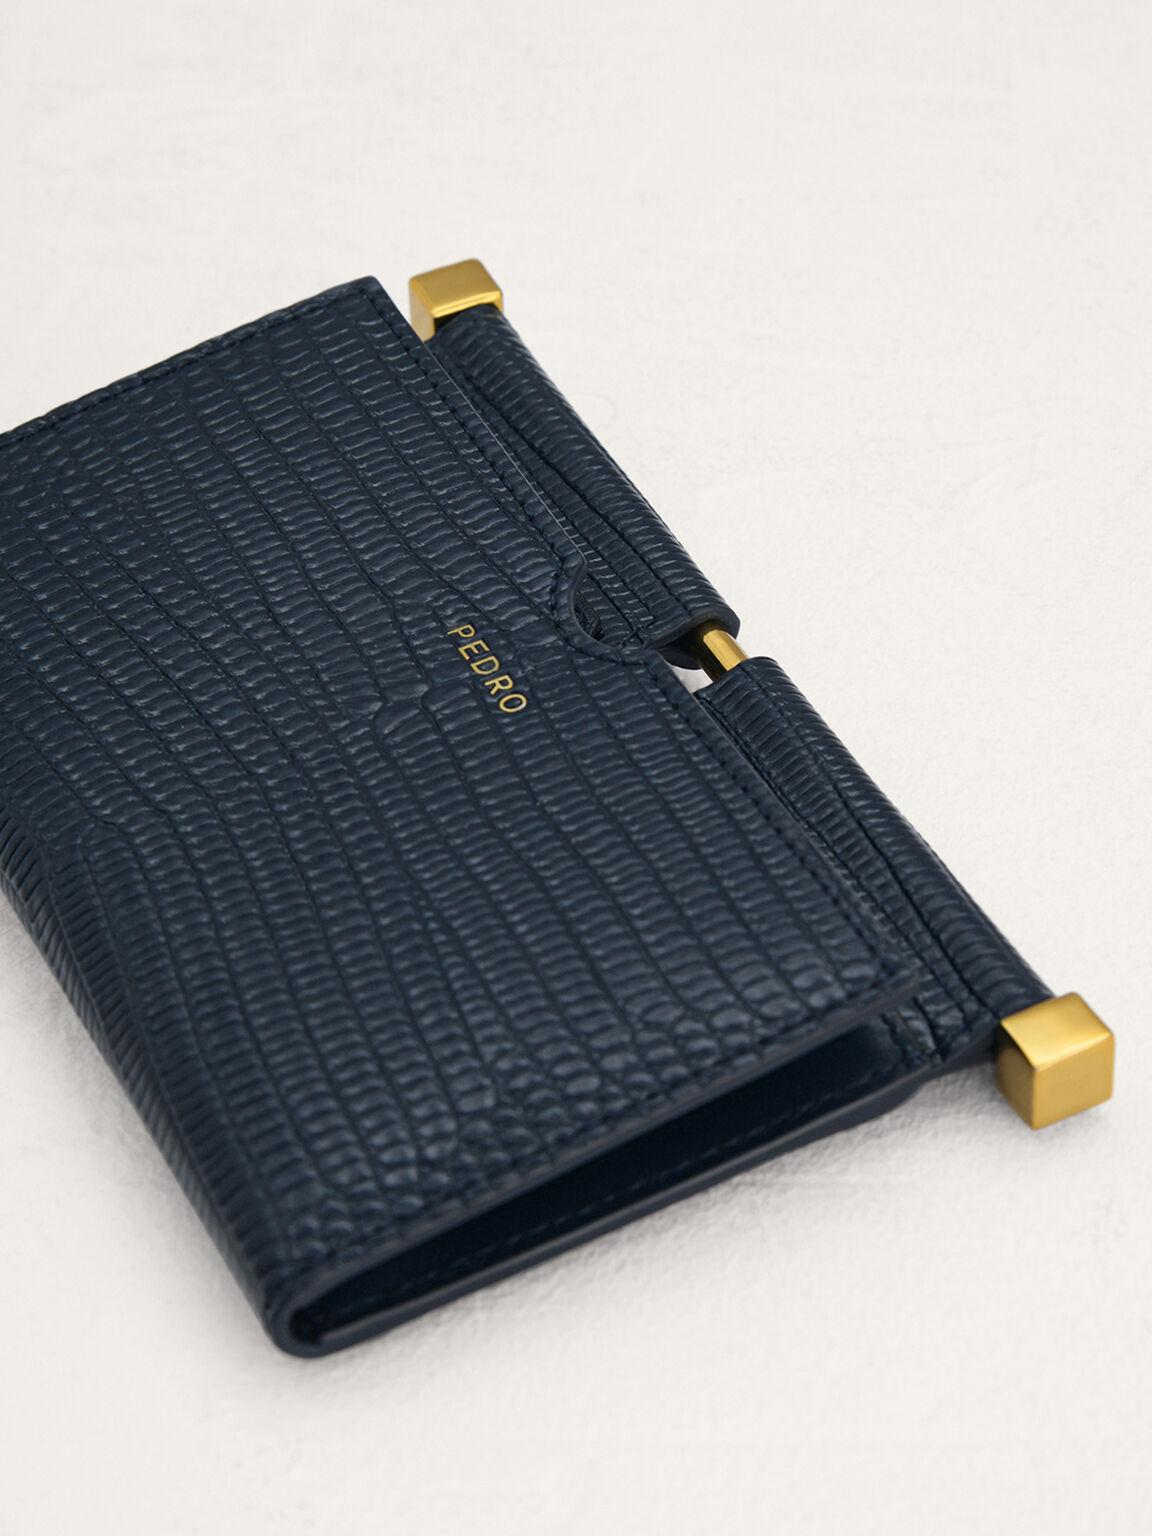 Lizard-Effect Leather Card Holder, Navy, hi-res